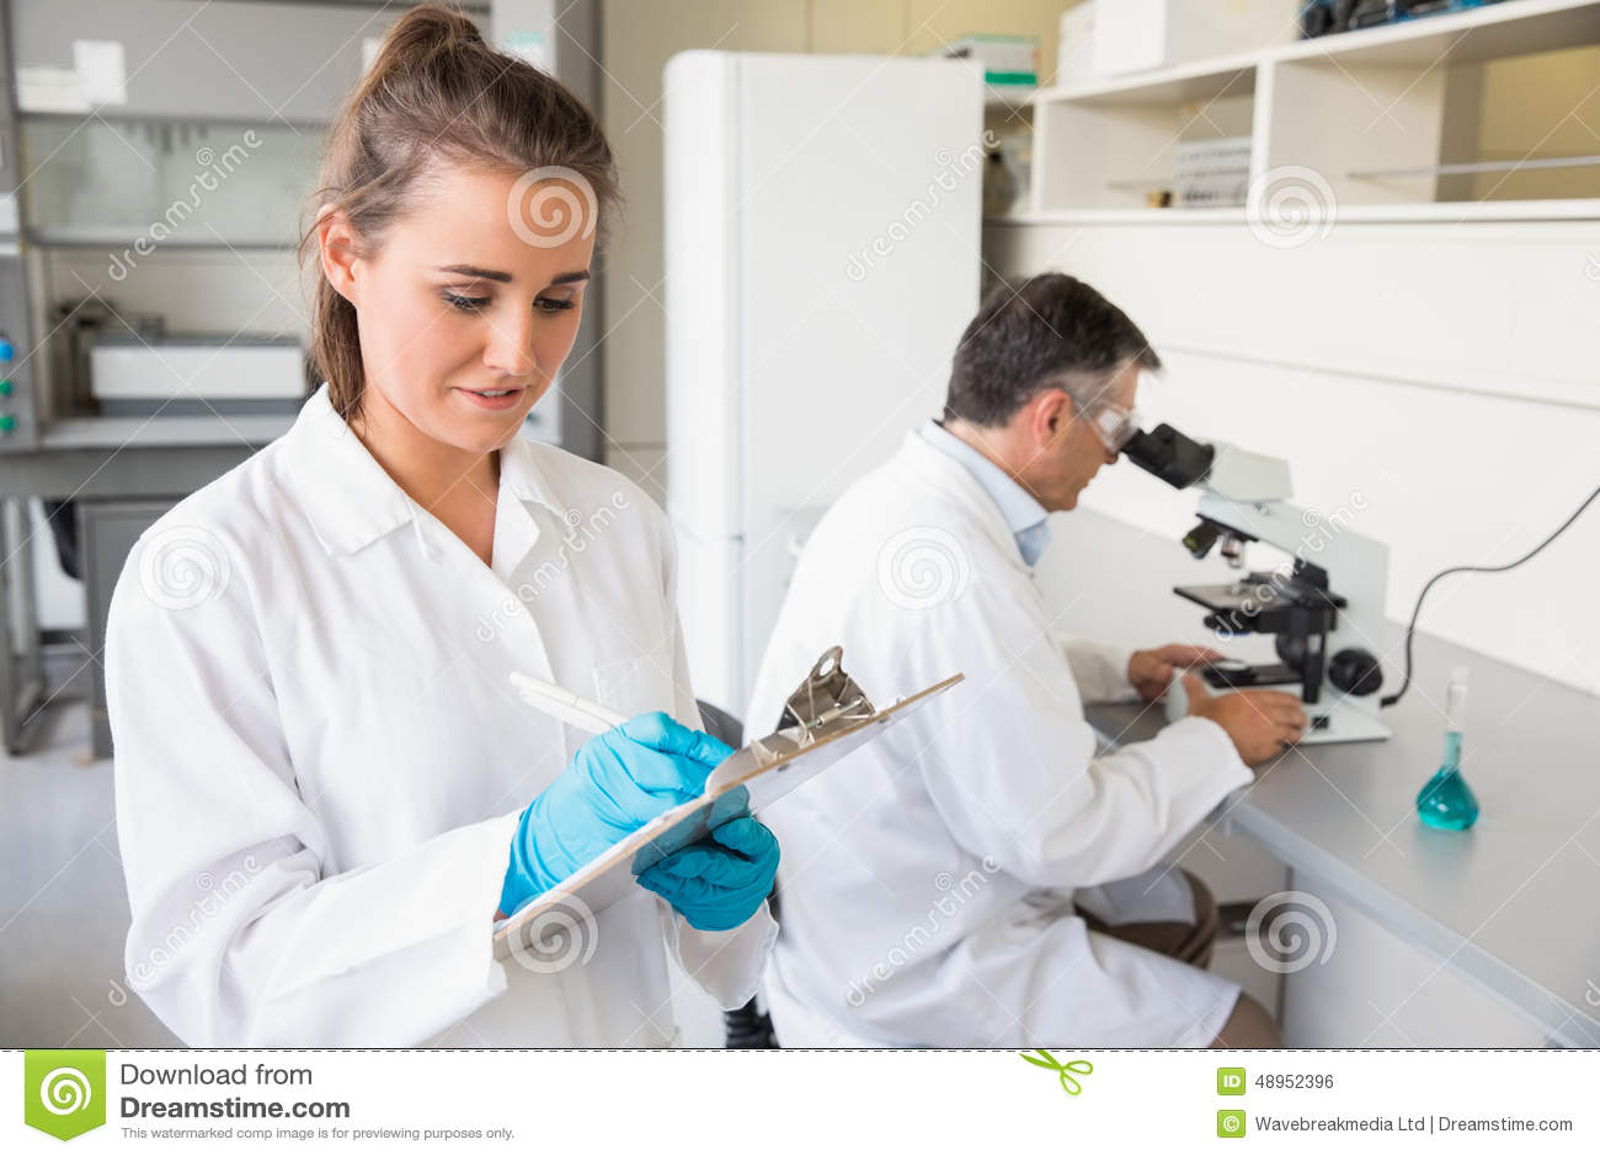 Scientist writing